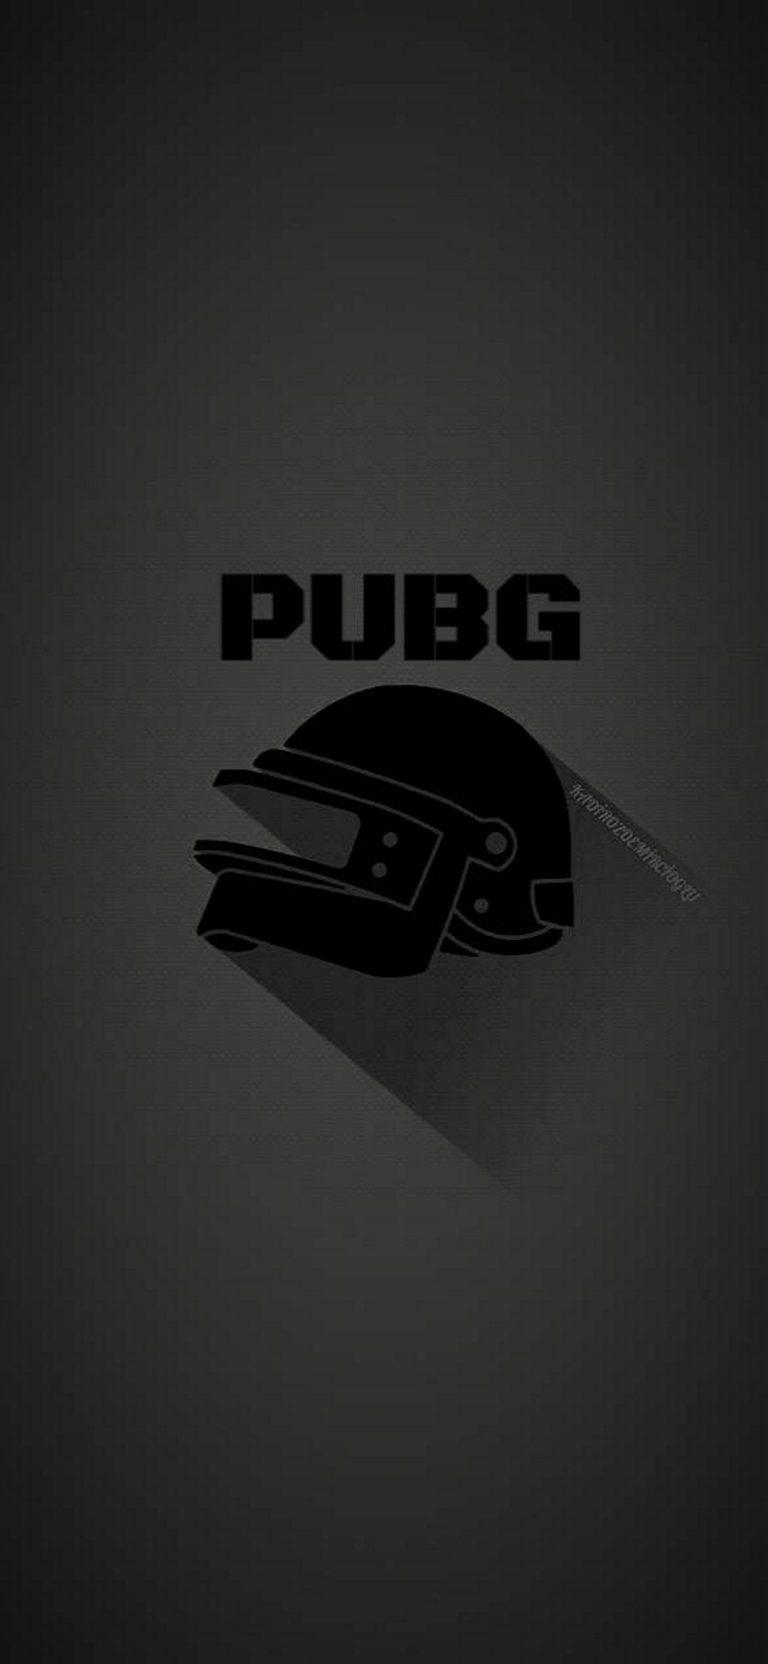 PUBG Phone Wallpaper 22 1080x2340 768x1664